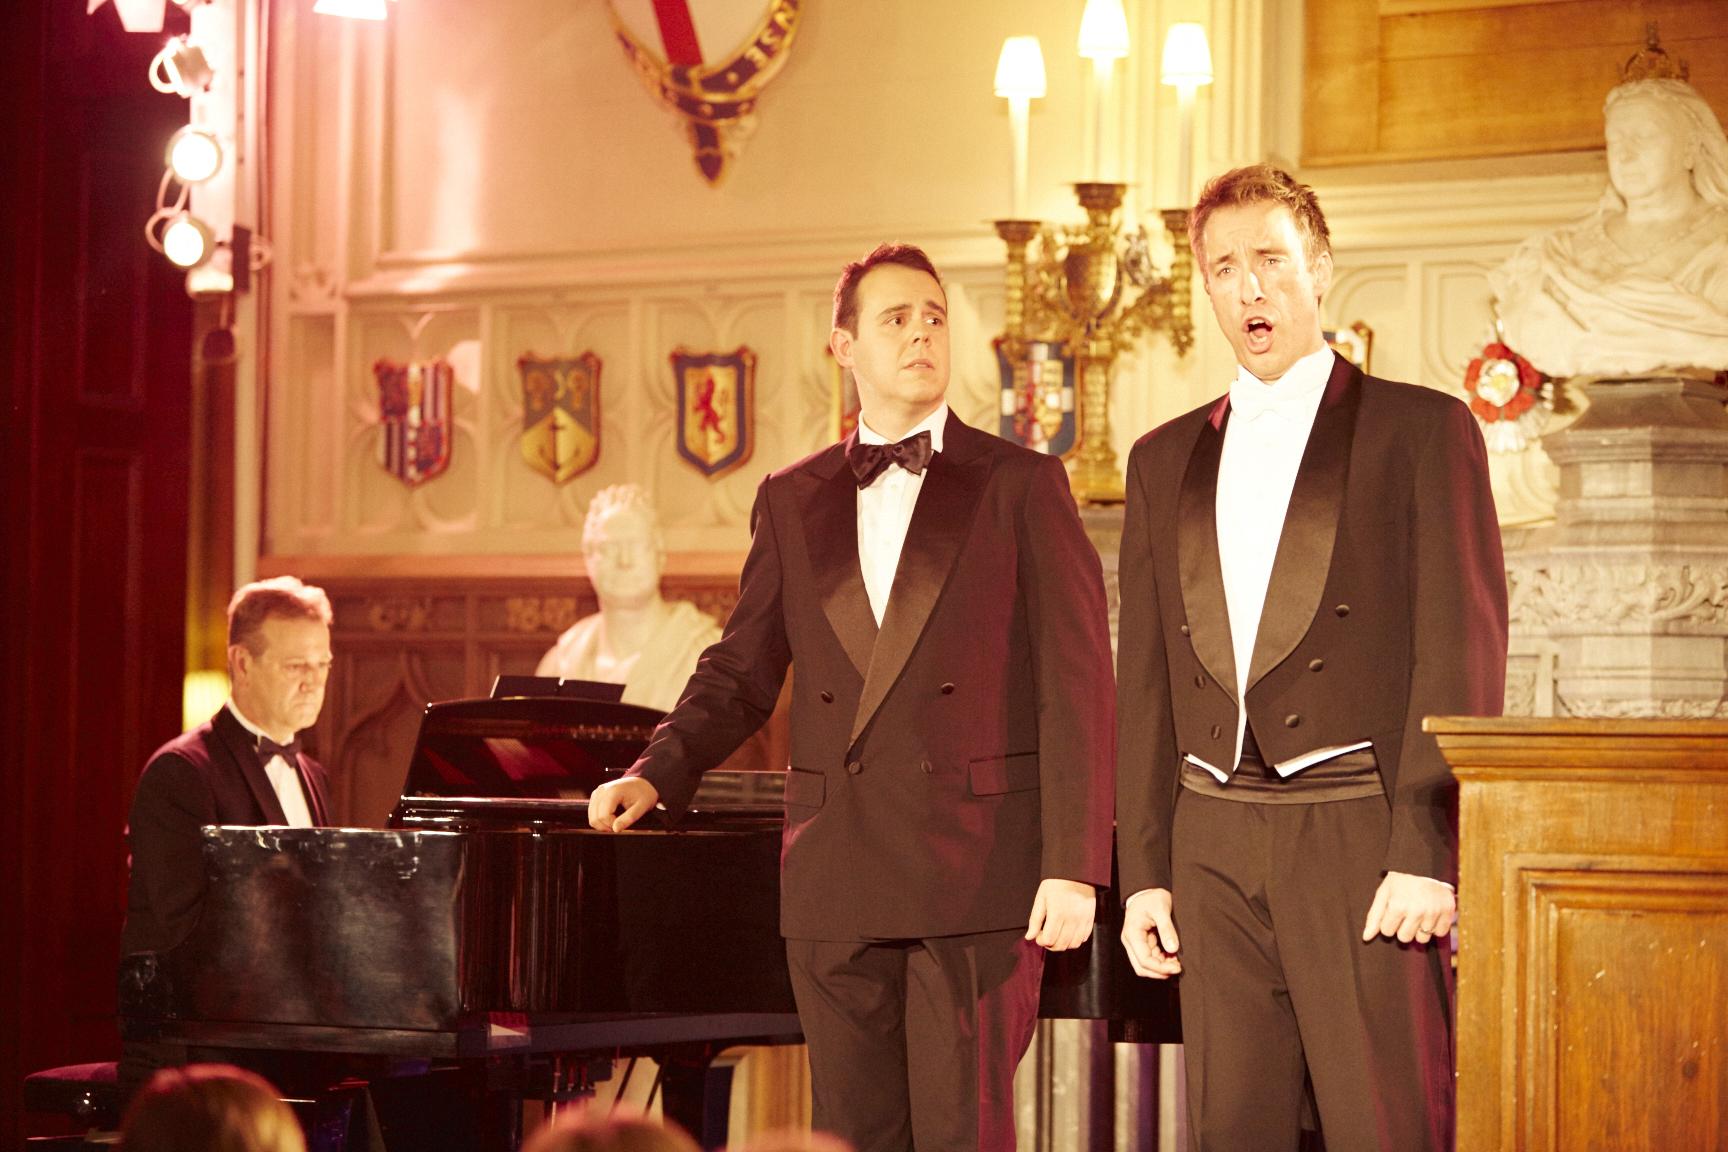 Sam Sakker and Yuriy Yurchuk - La Boheme Act 4 Duet